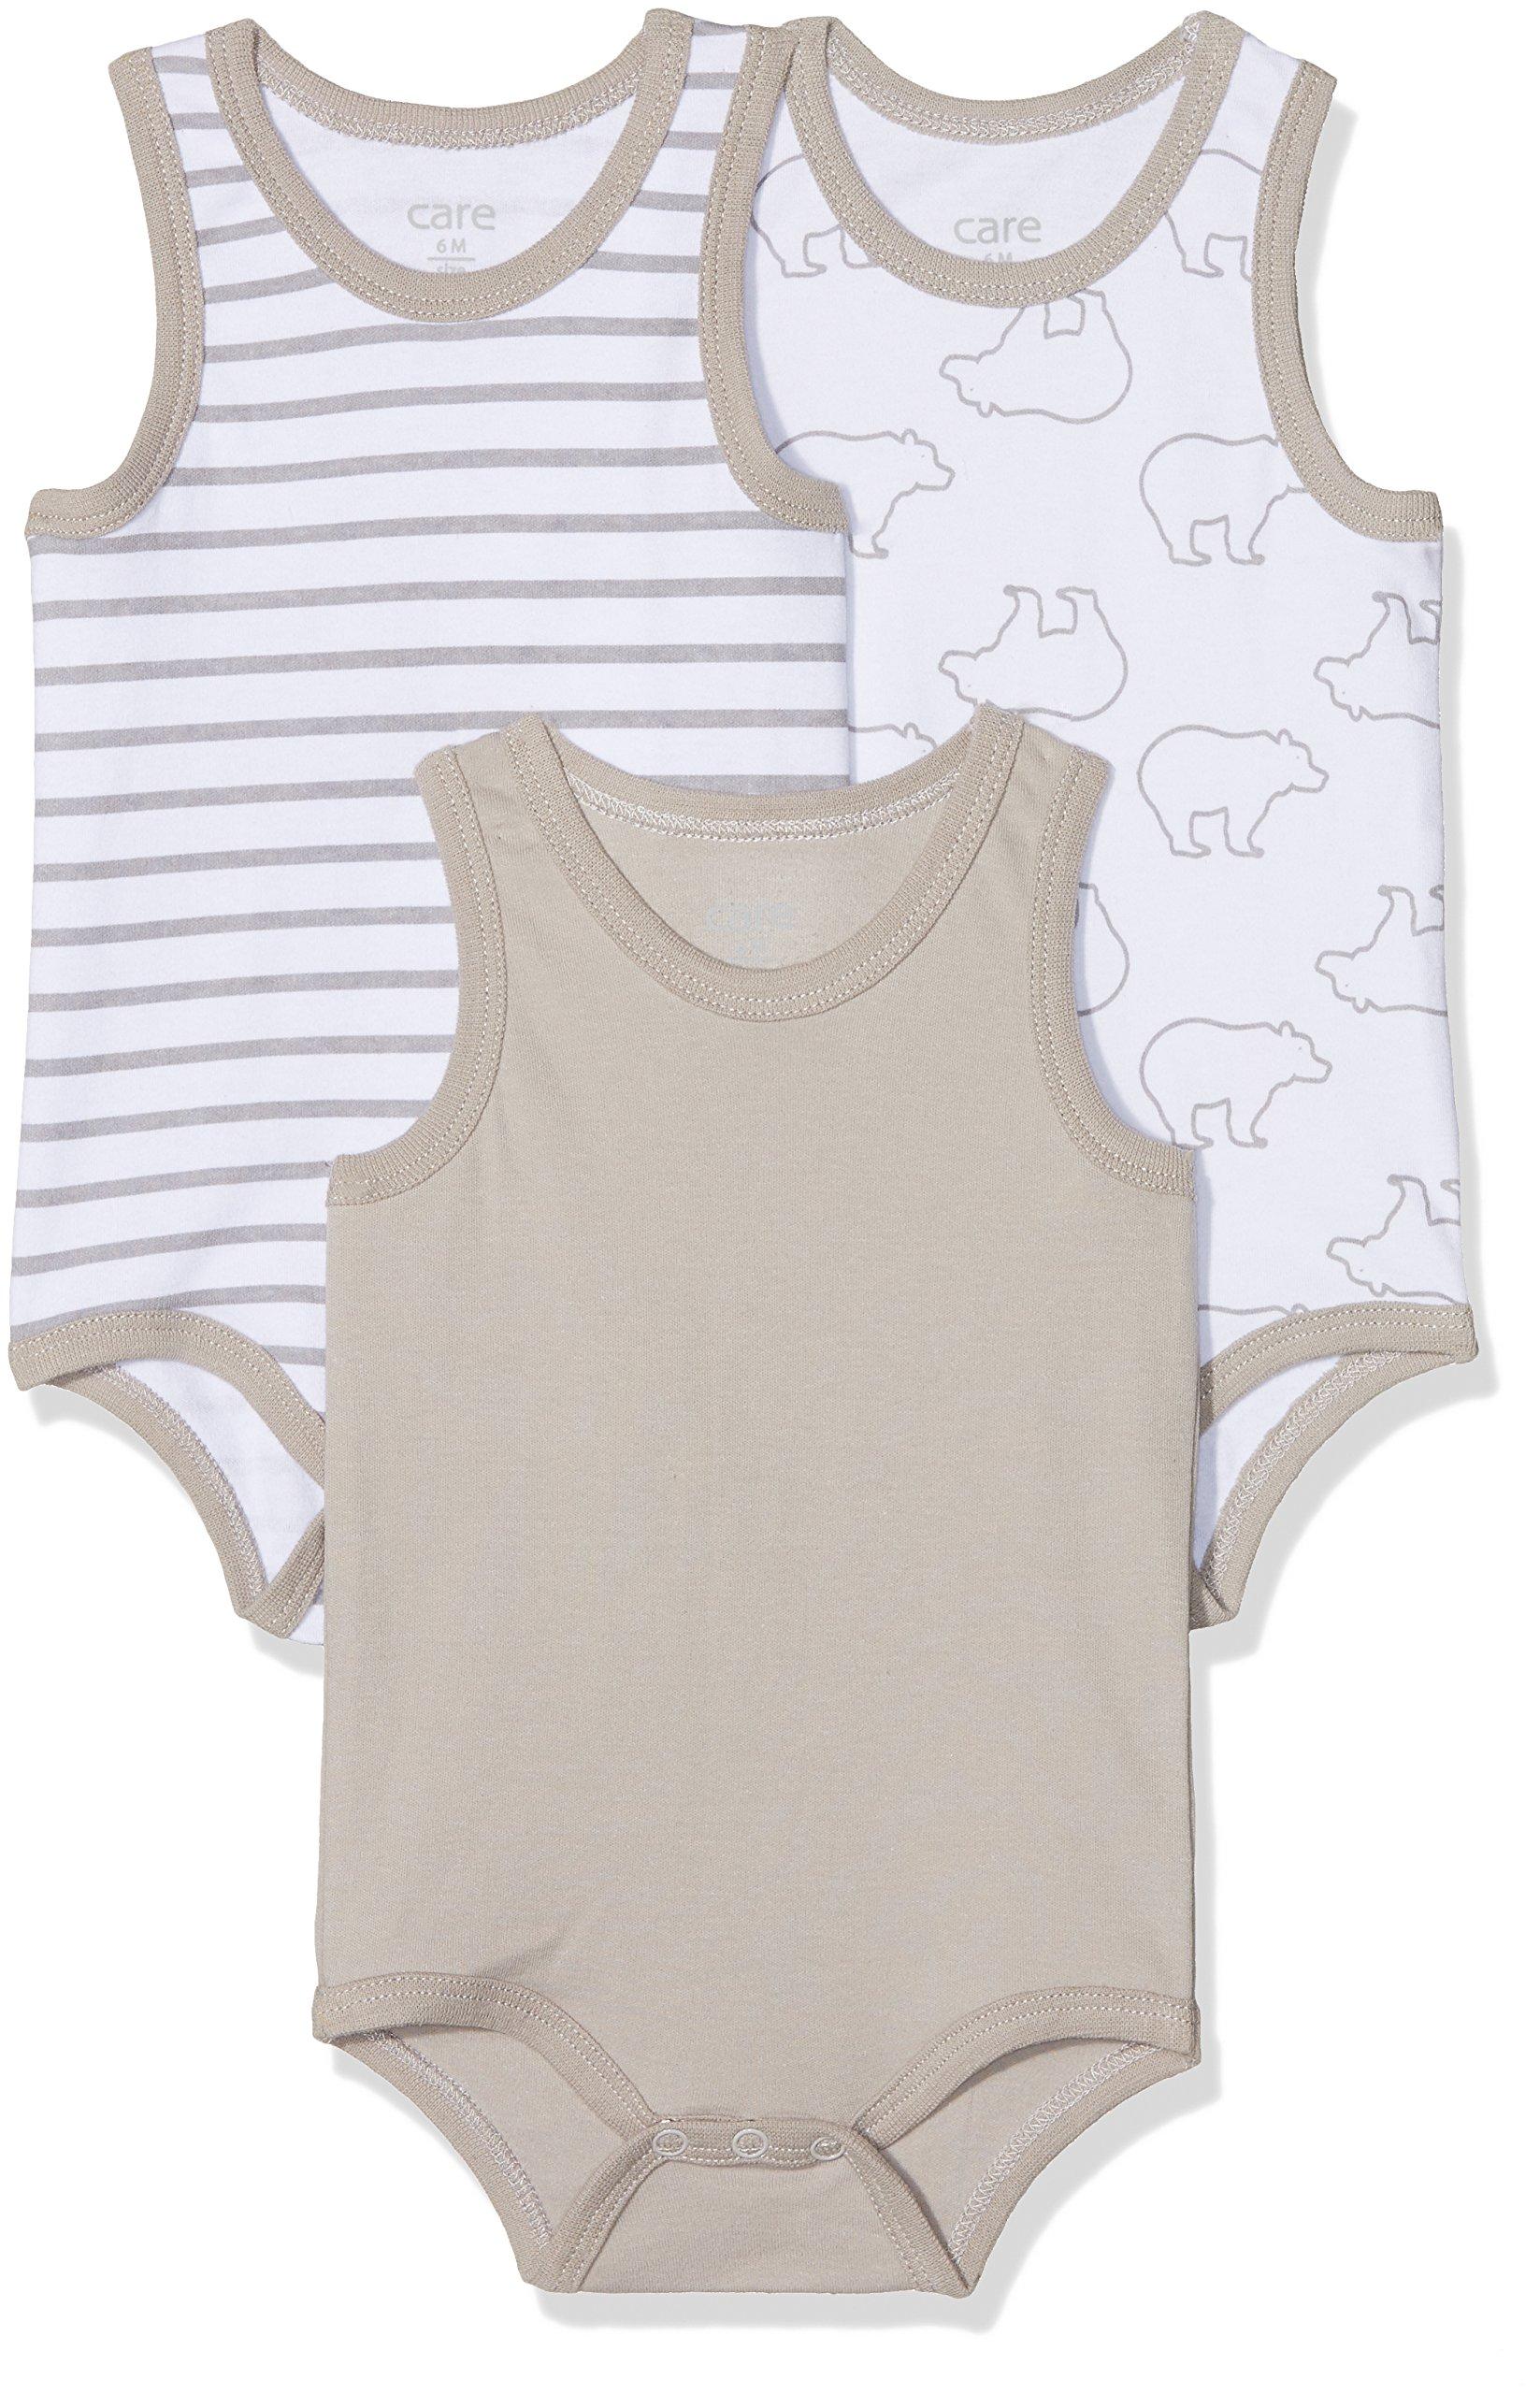 Amazon Exclusiva: Care Body (Pack de 3 Bebé Unisex